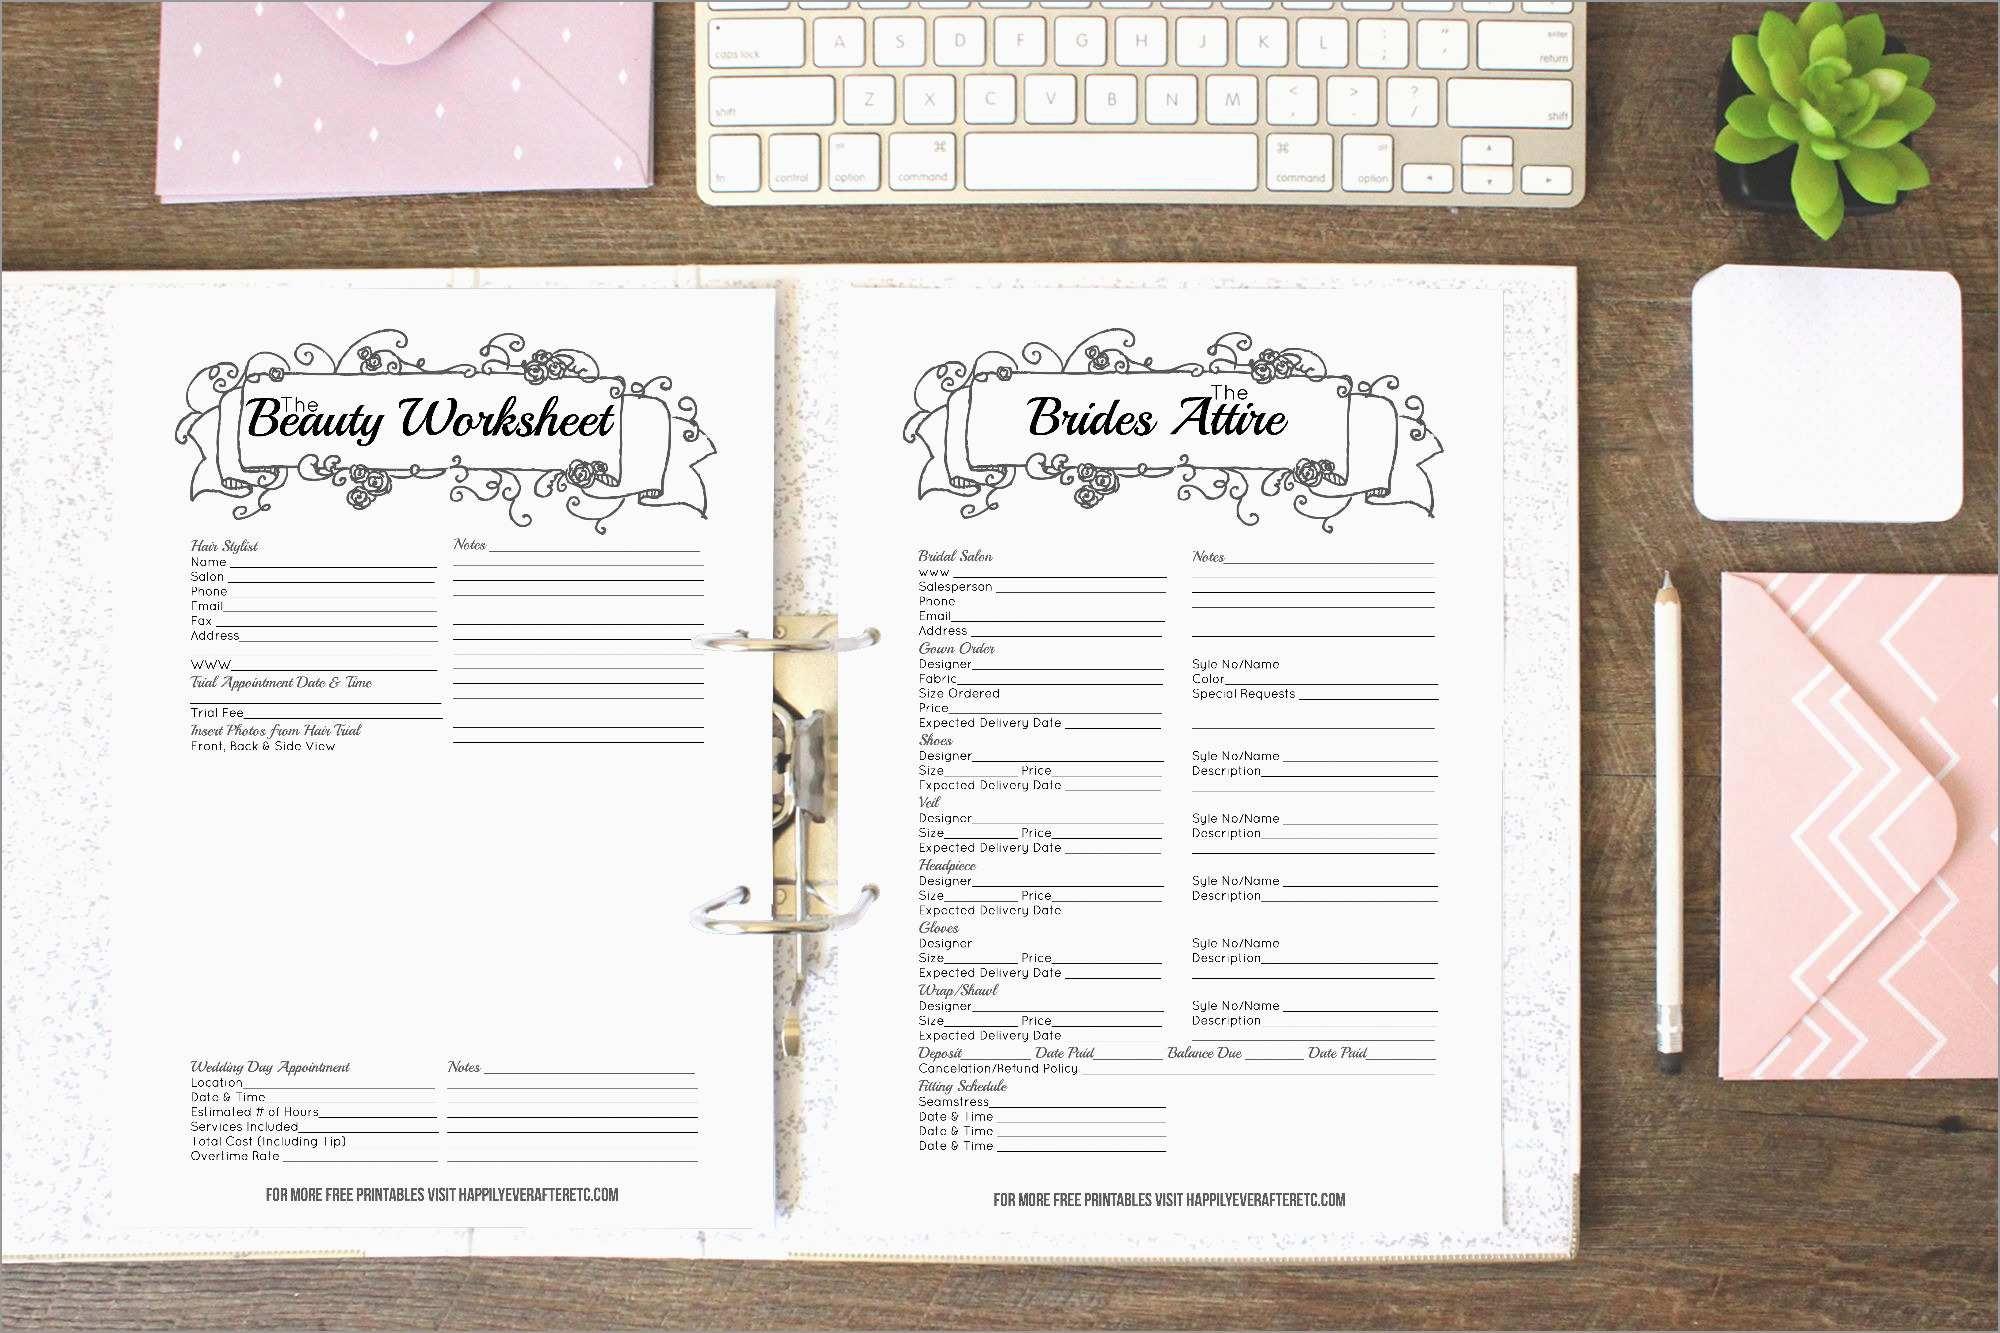 Free Printable Wedding Binder Templates Wonderfully Wedding Planner - Free Printable Wedding Organizer Templates